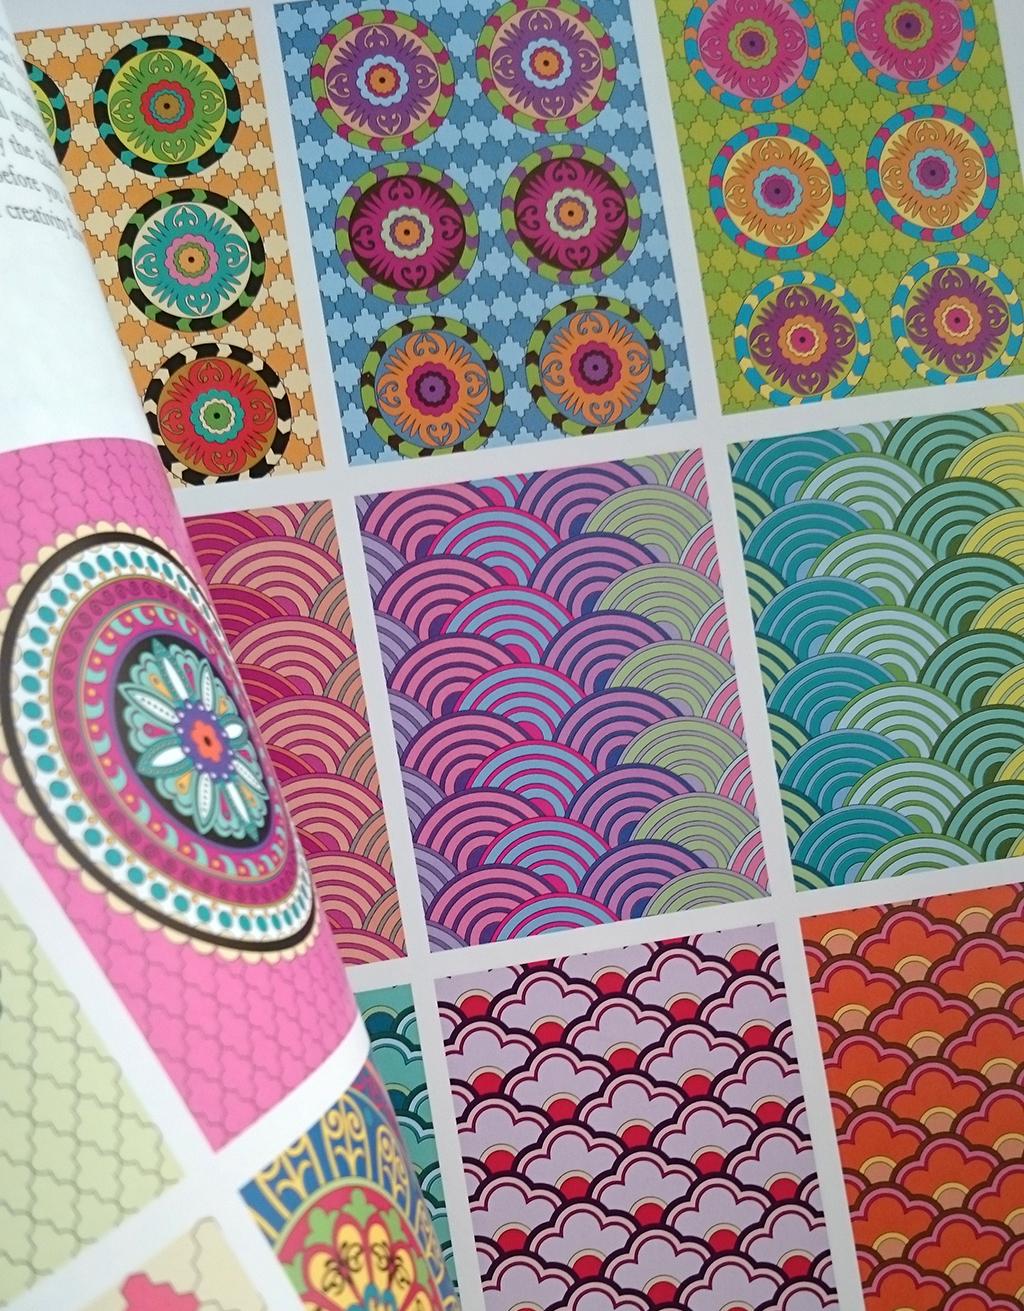 World-Beat-Designs-Mandalas-and-More-Coloring-Book-03